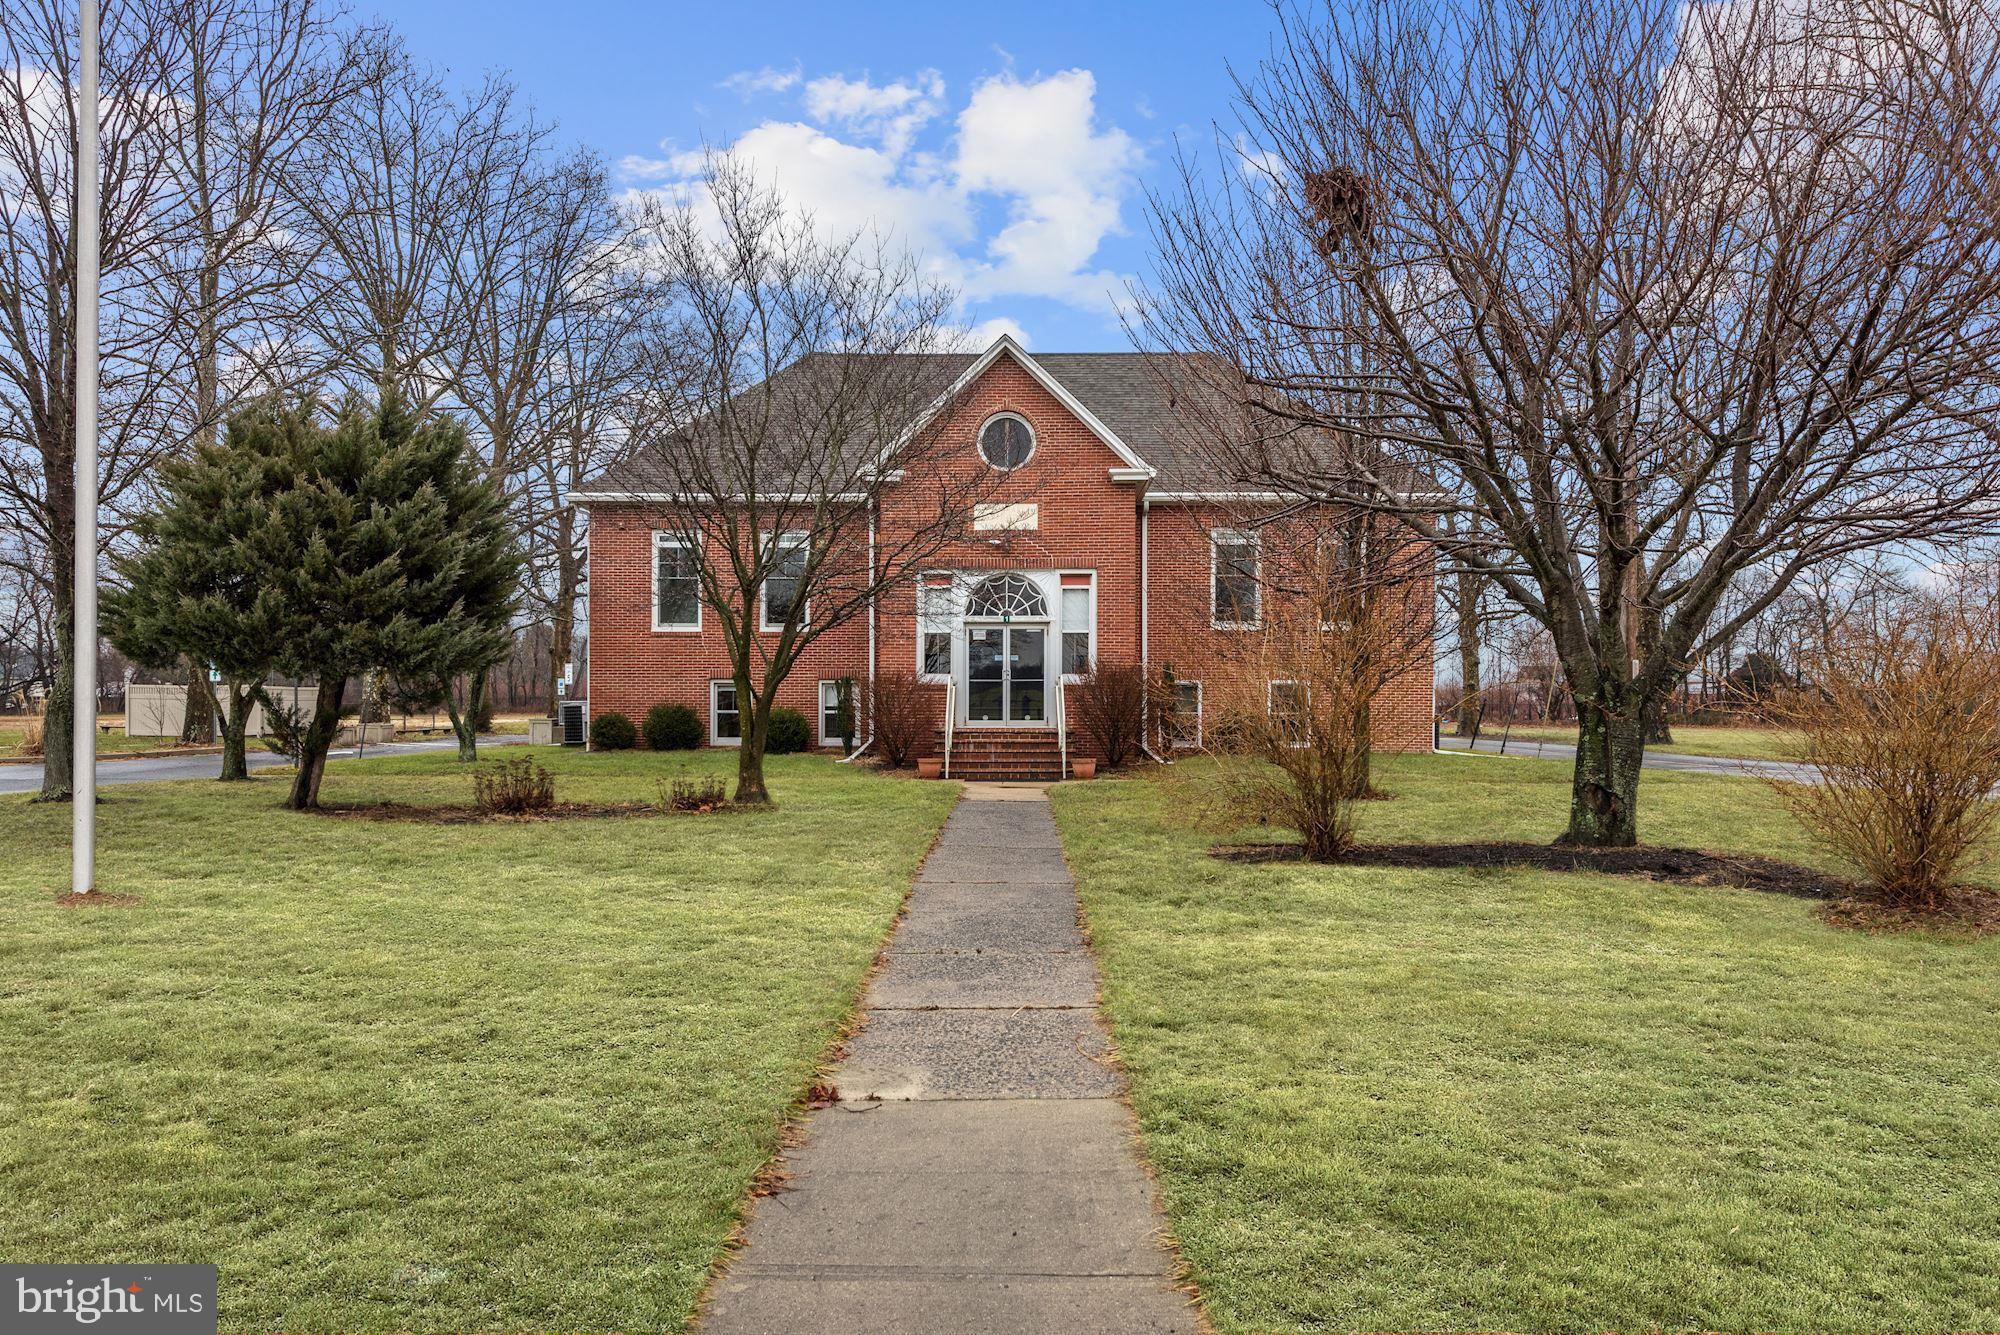 180 Carranza Road, Tabernacle, NJ 08088